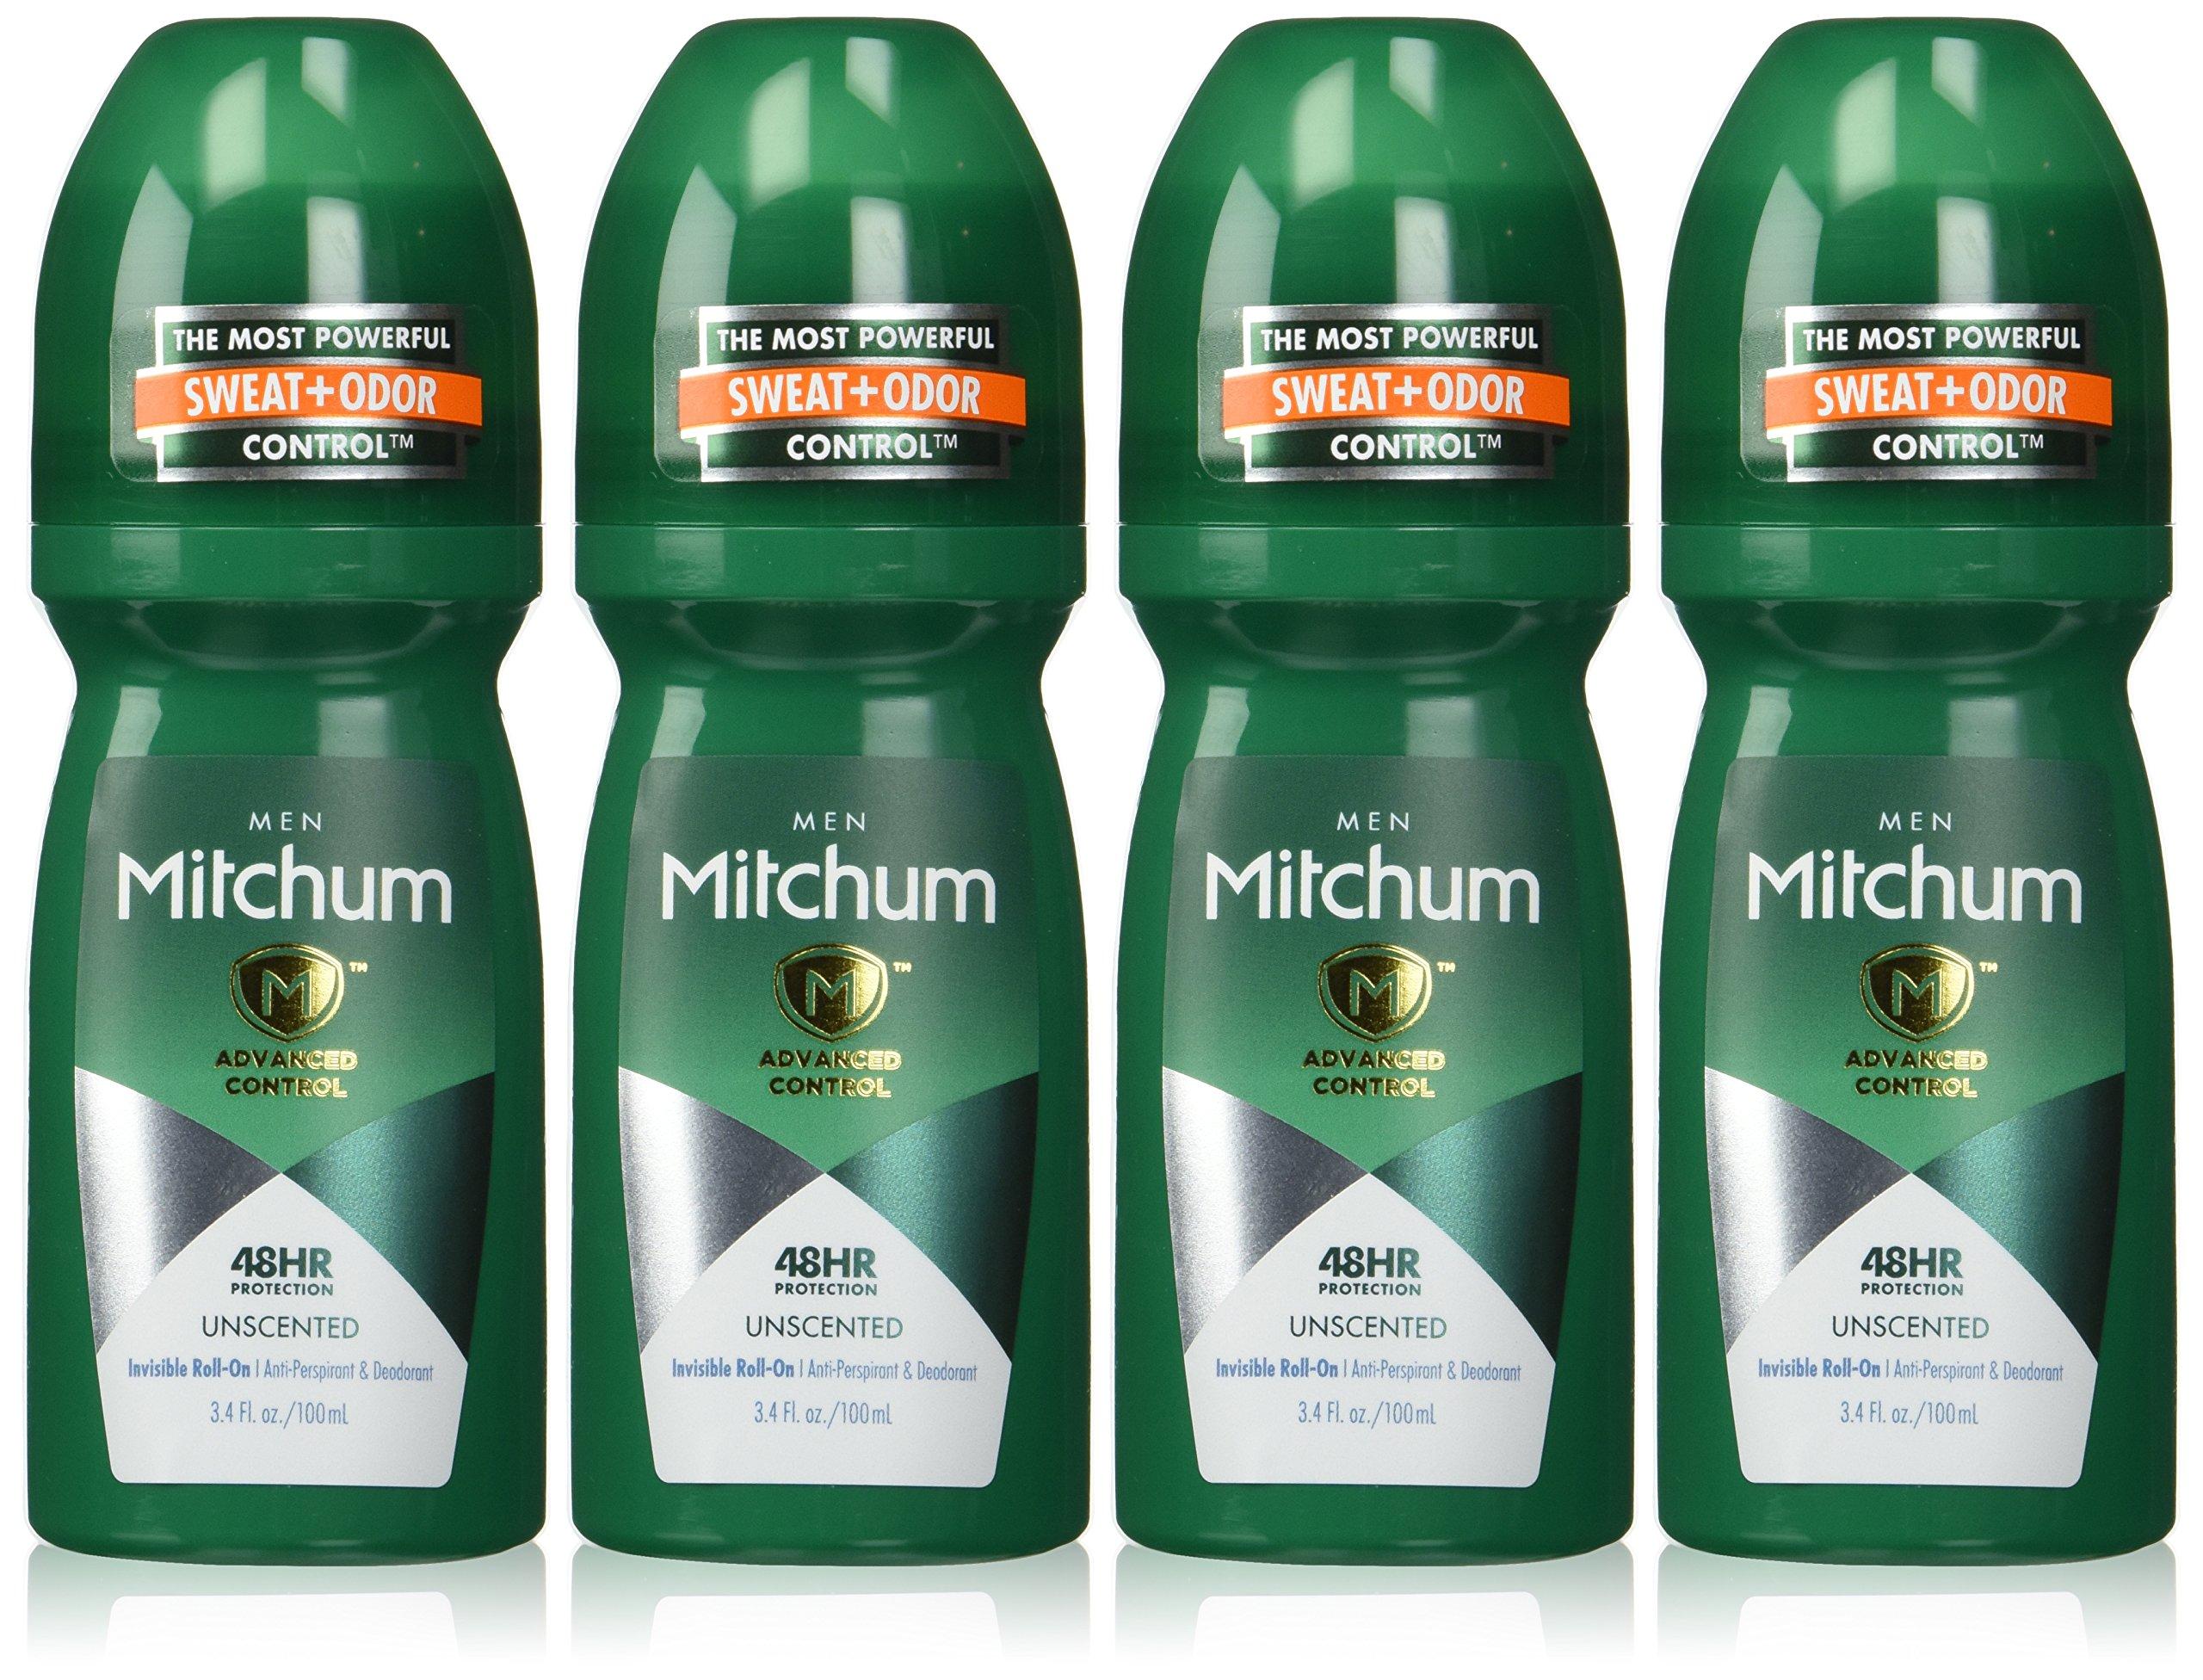 Mitchum Anti-Perspirant & Deodorant, Roll On, Advanced Unscented, 3.4 fl oz (100 ml) (Pack of 4)